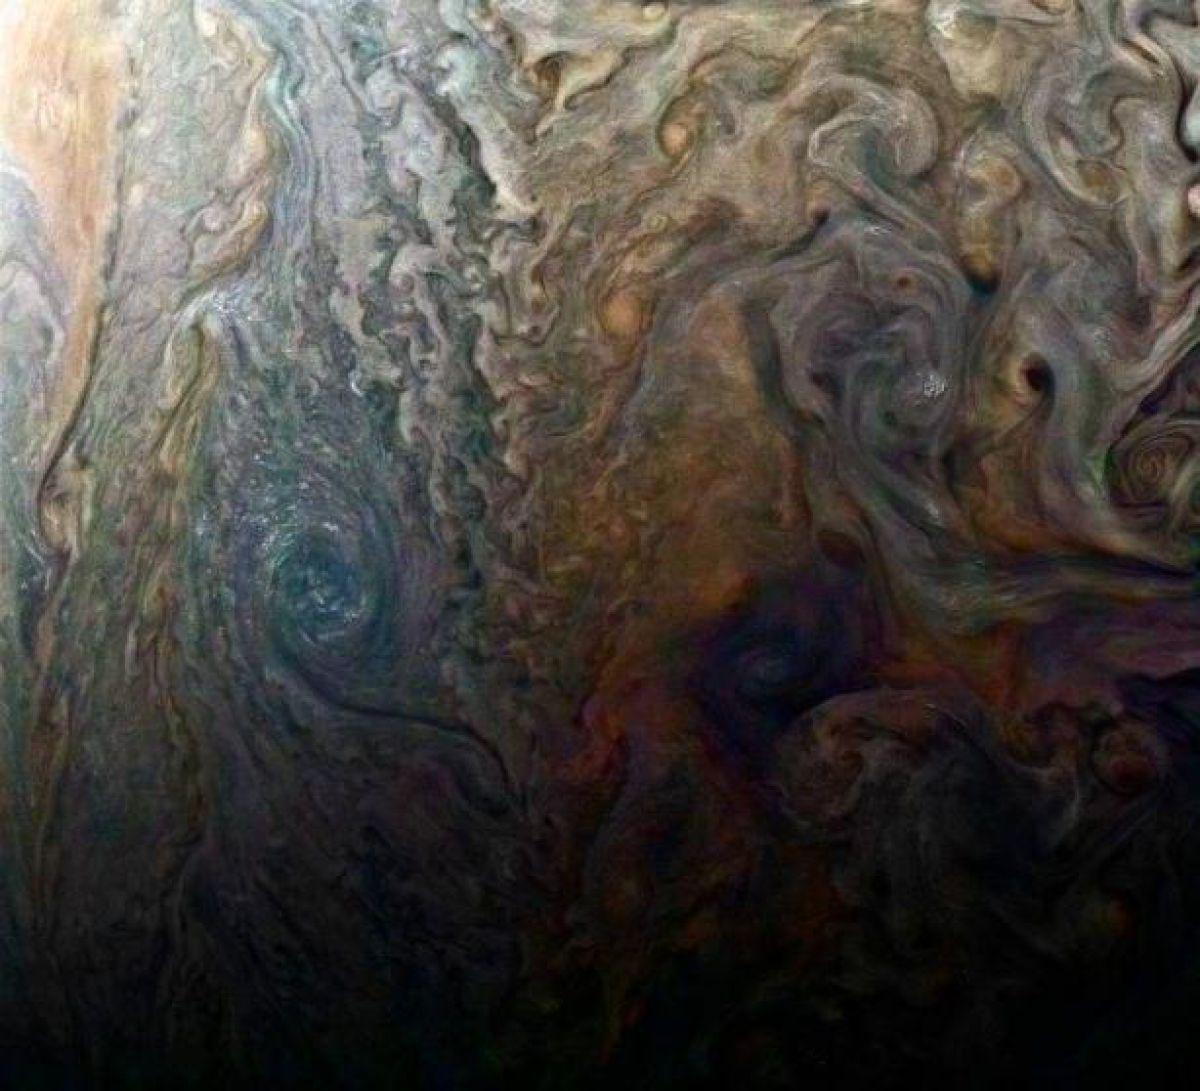 image_58d7ca5a7ae0e5.378572651 Опубликованы фото крупного урагана на Юпитере